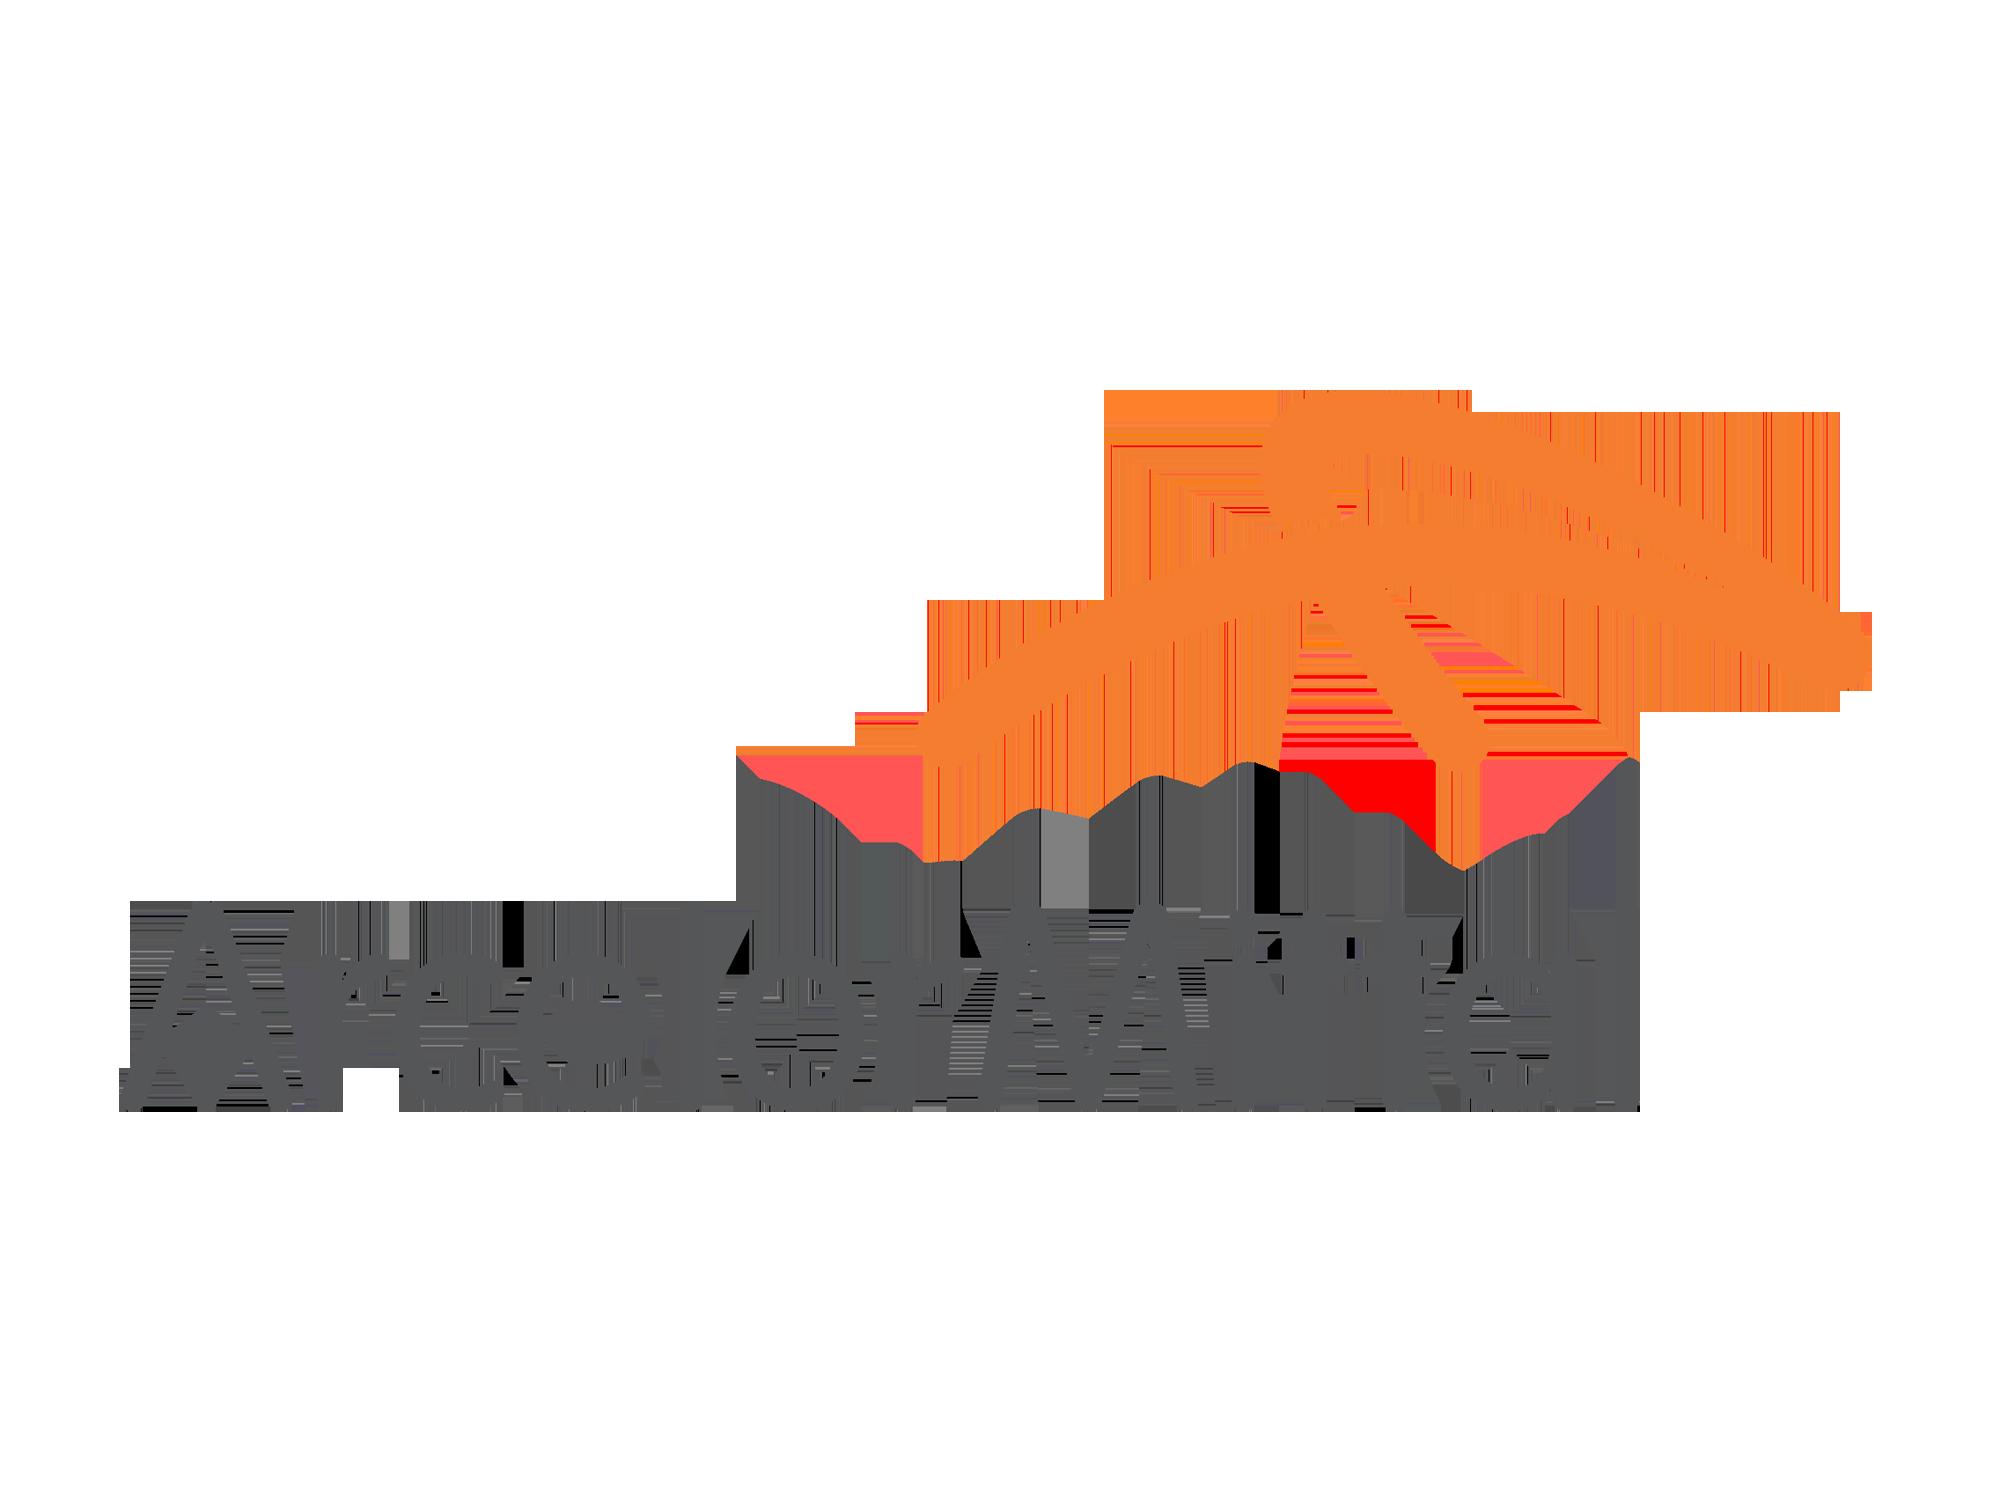 https://prestoninternational.com/wp-content/uploads/2018/06/cf8776b5-d49d-4e90-b6b5-32c44bb52105ArcelorMittal-logo-and-wordmark.png